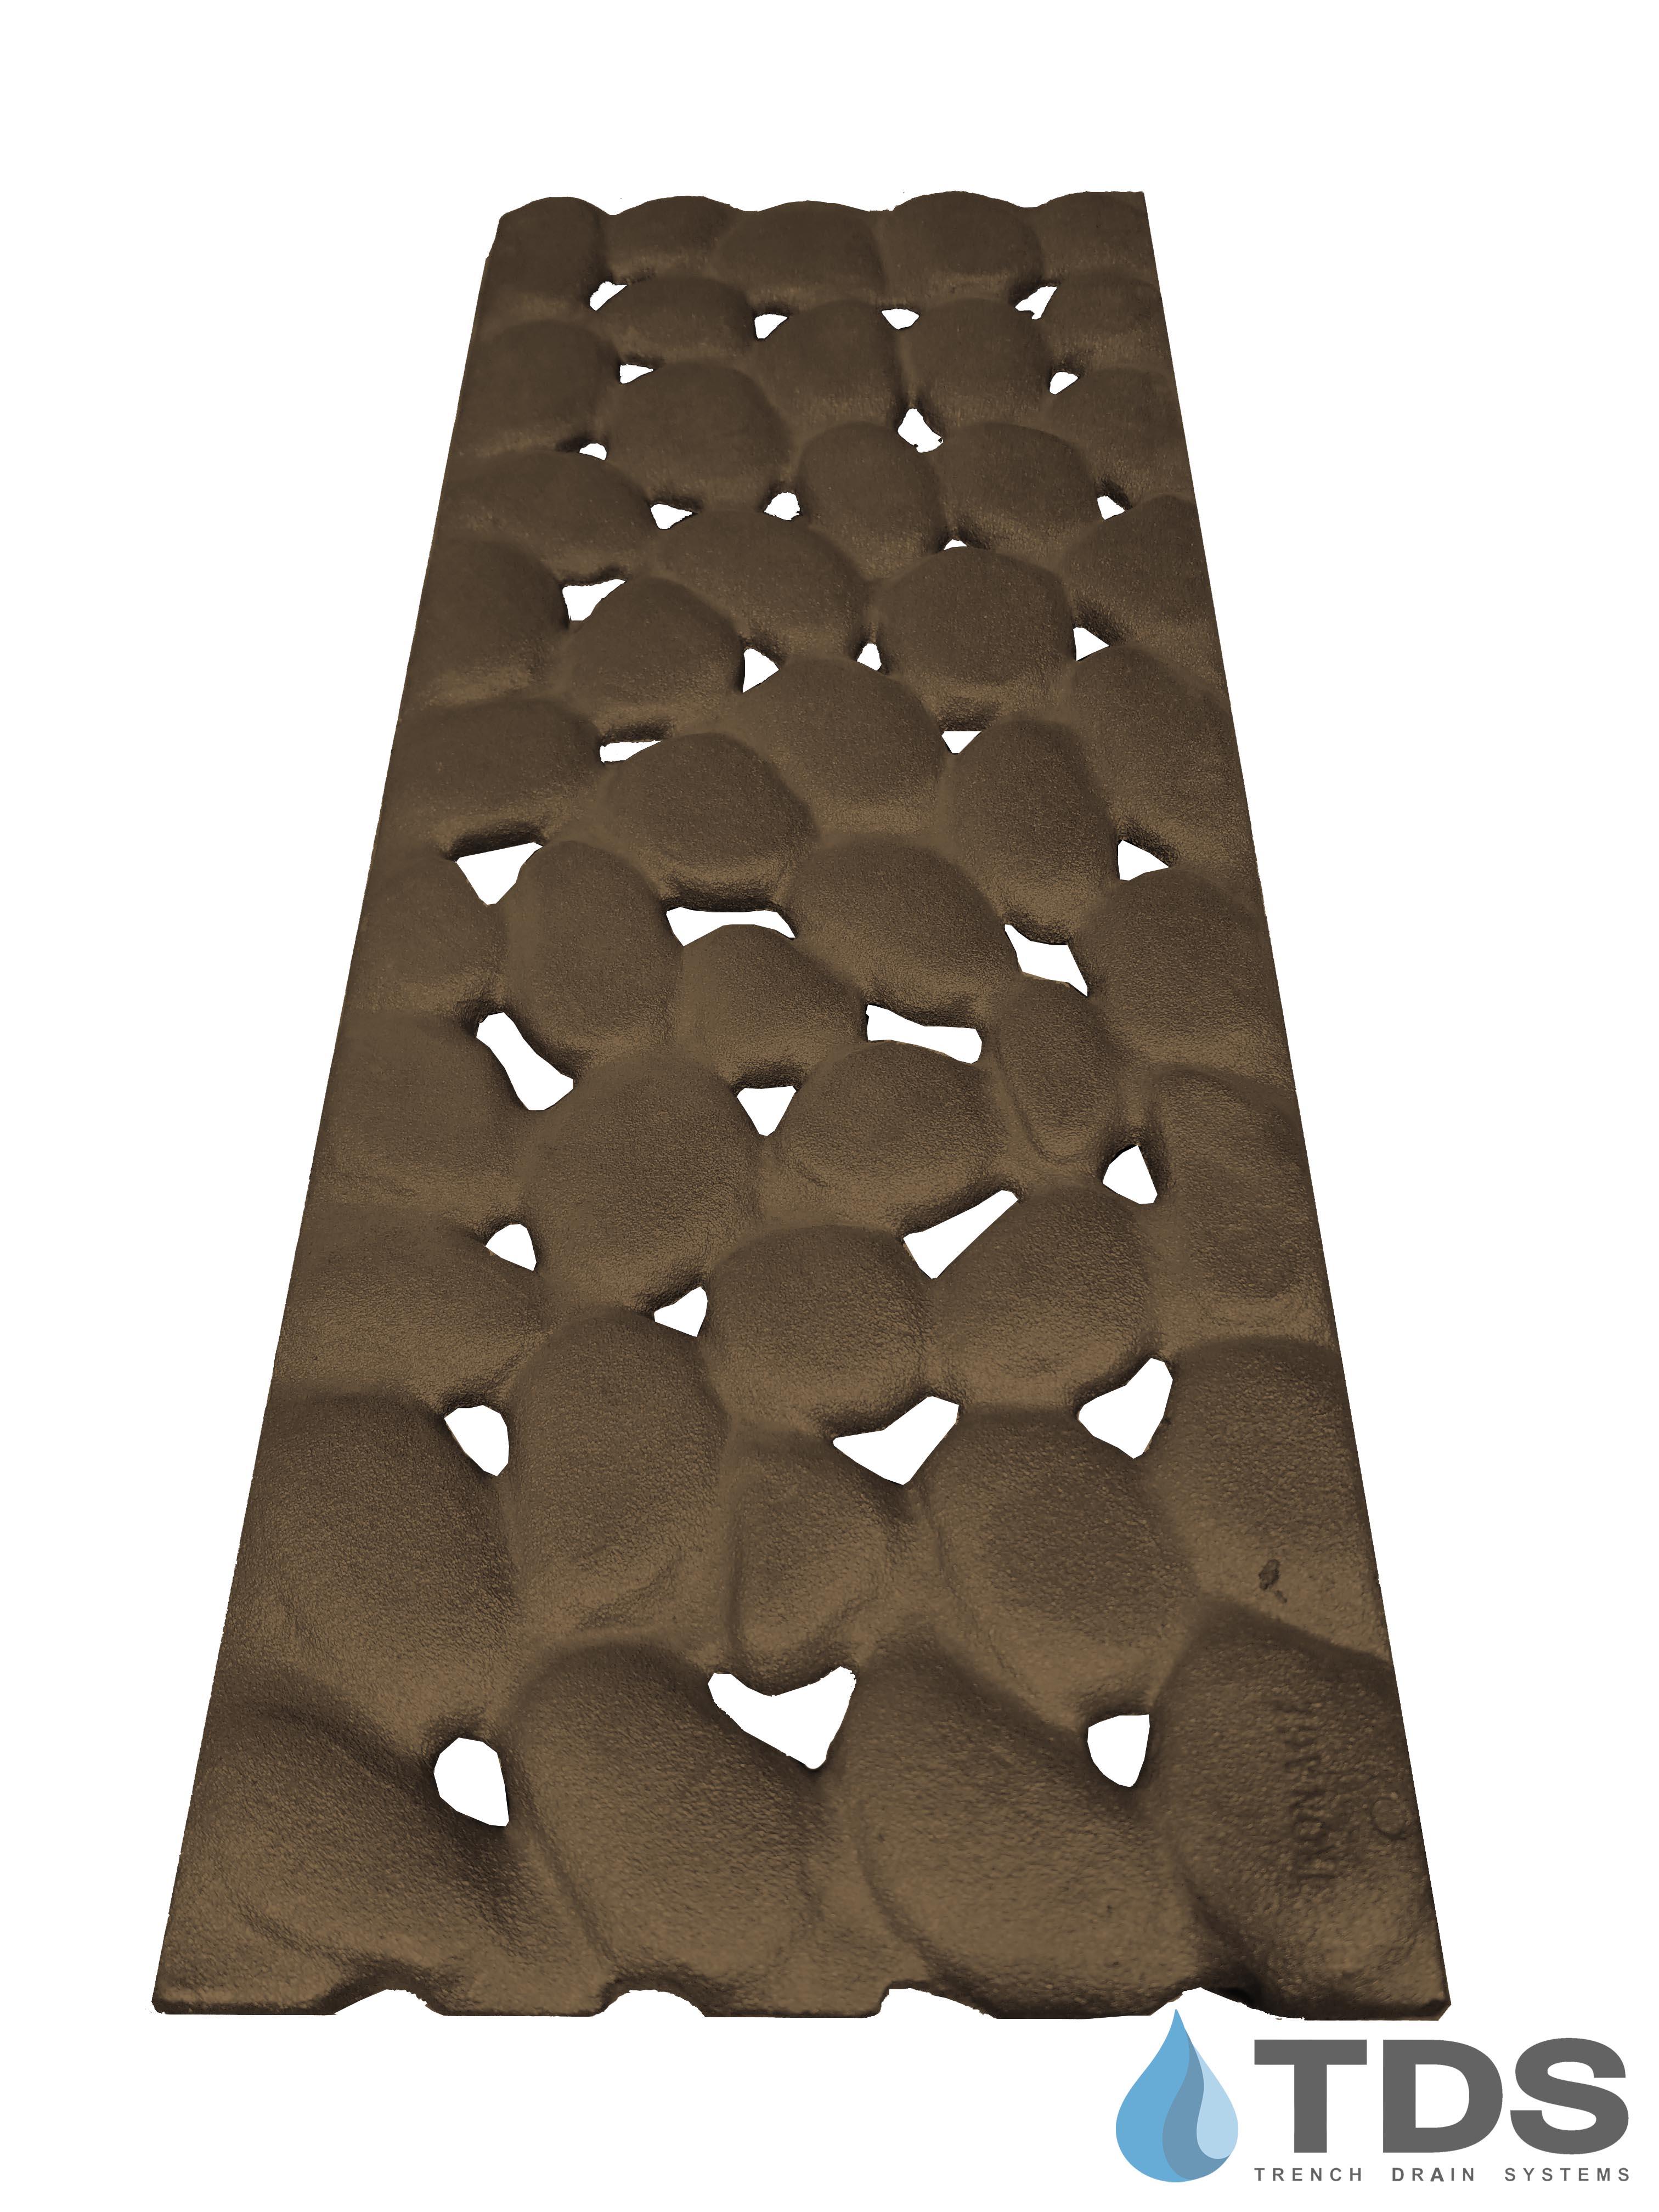 Iron Age 8x20 River Rock Grate - BoOF deco grate cast iron